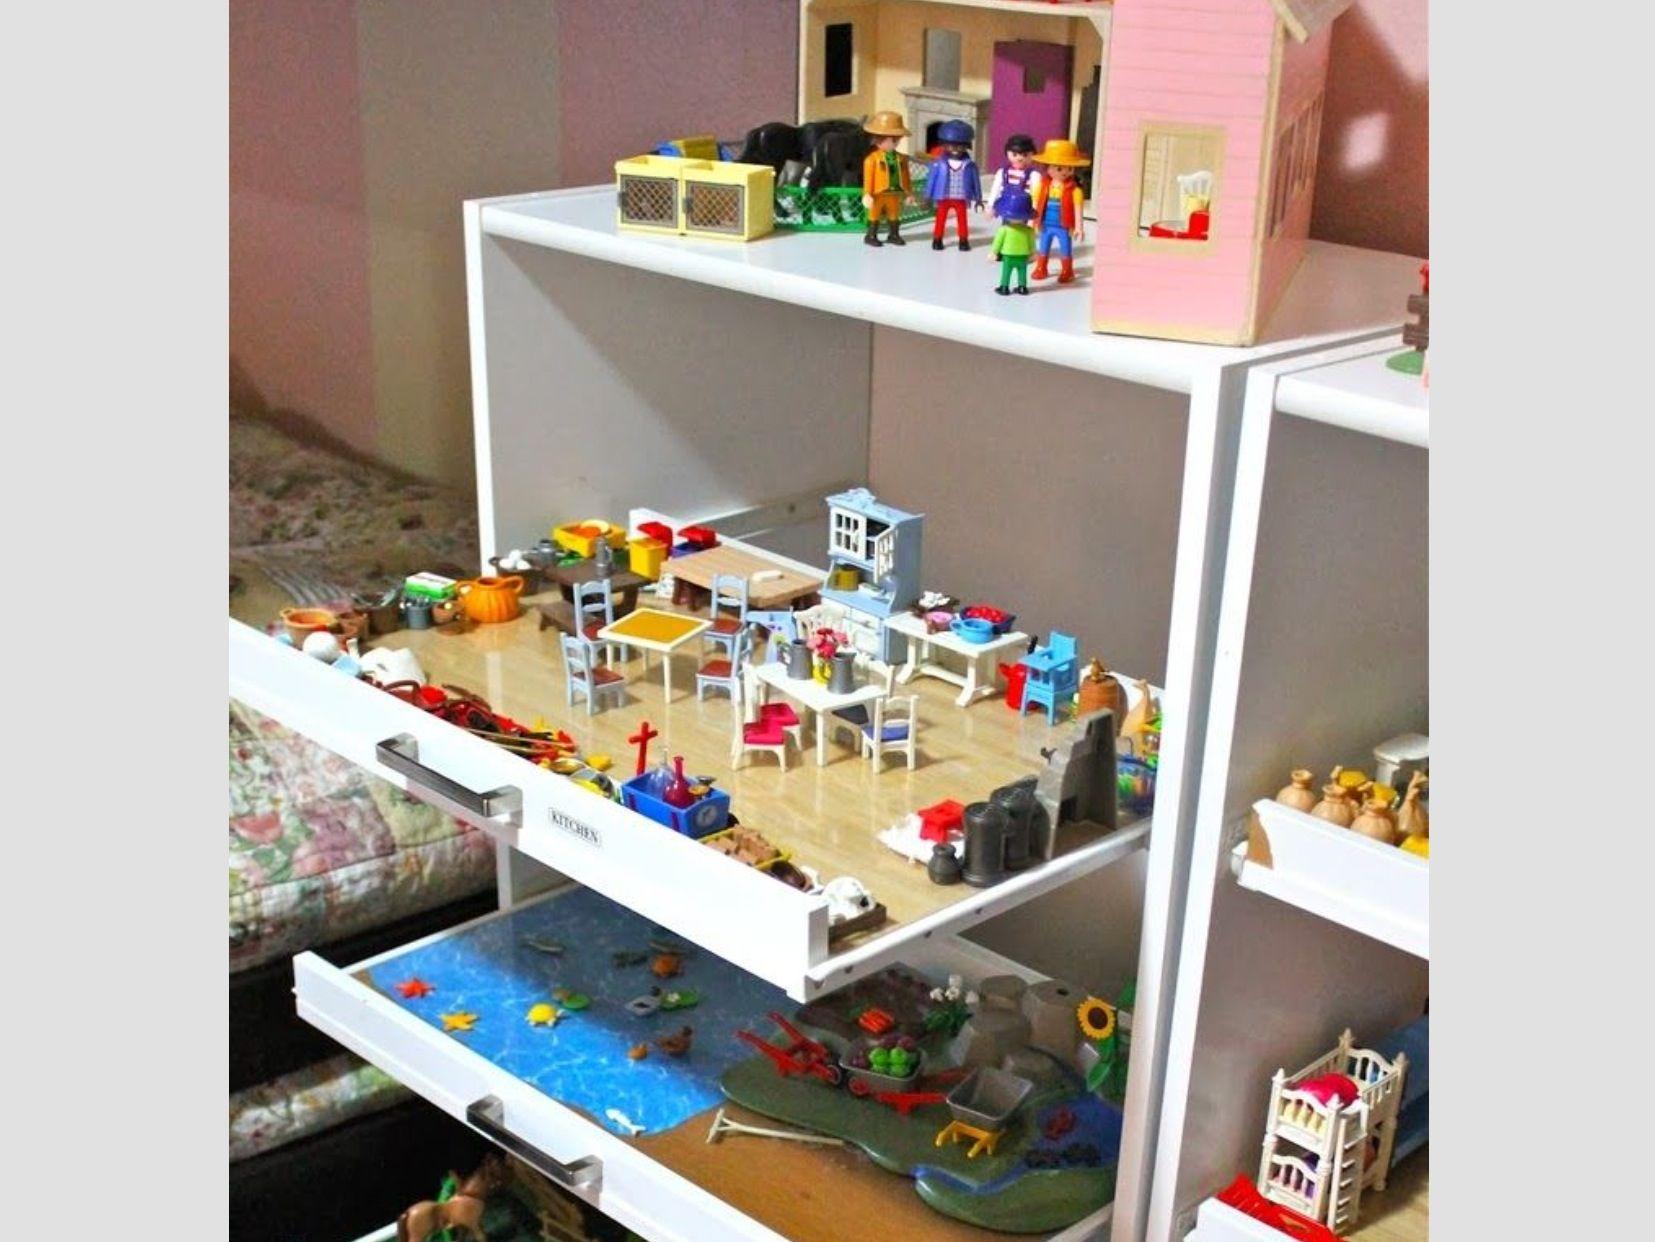 Love this! Kinder zimmer, Kinderspielzimmer, Playmobil